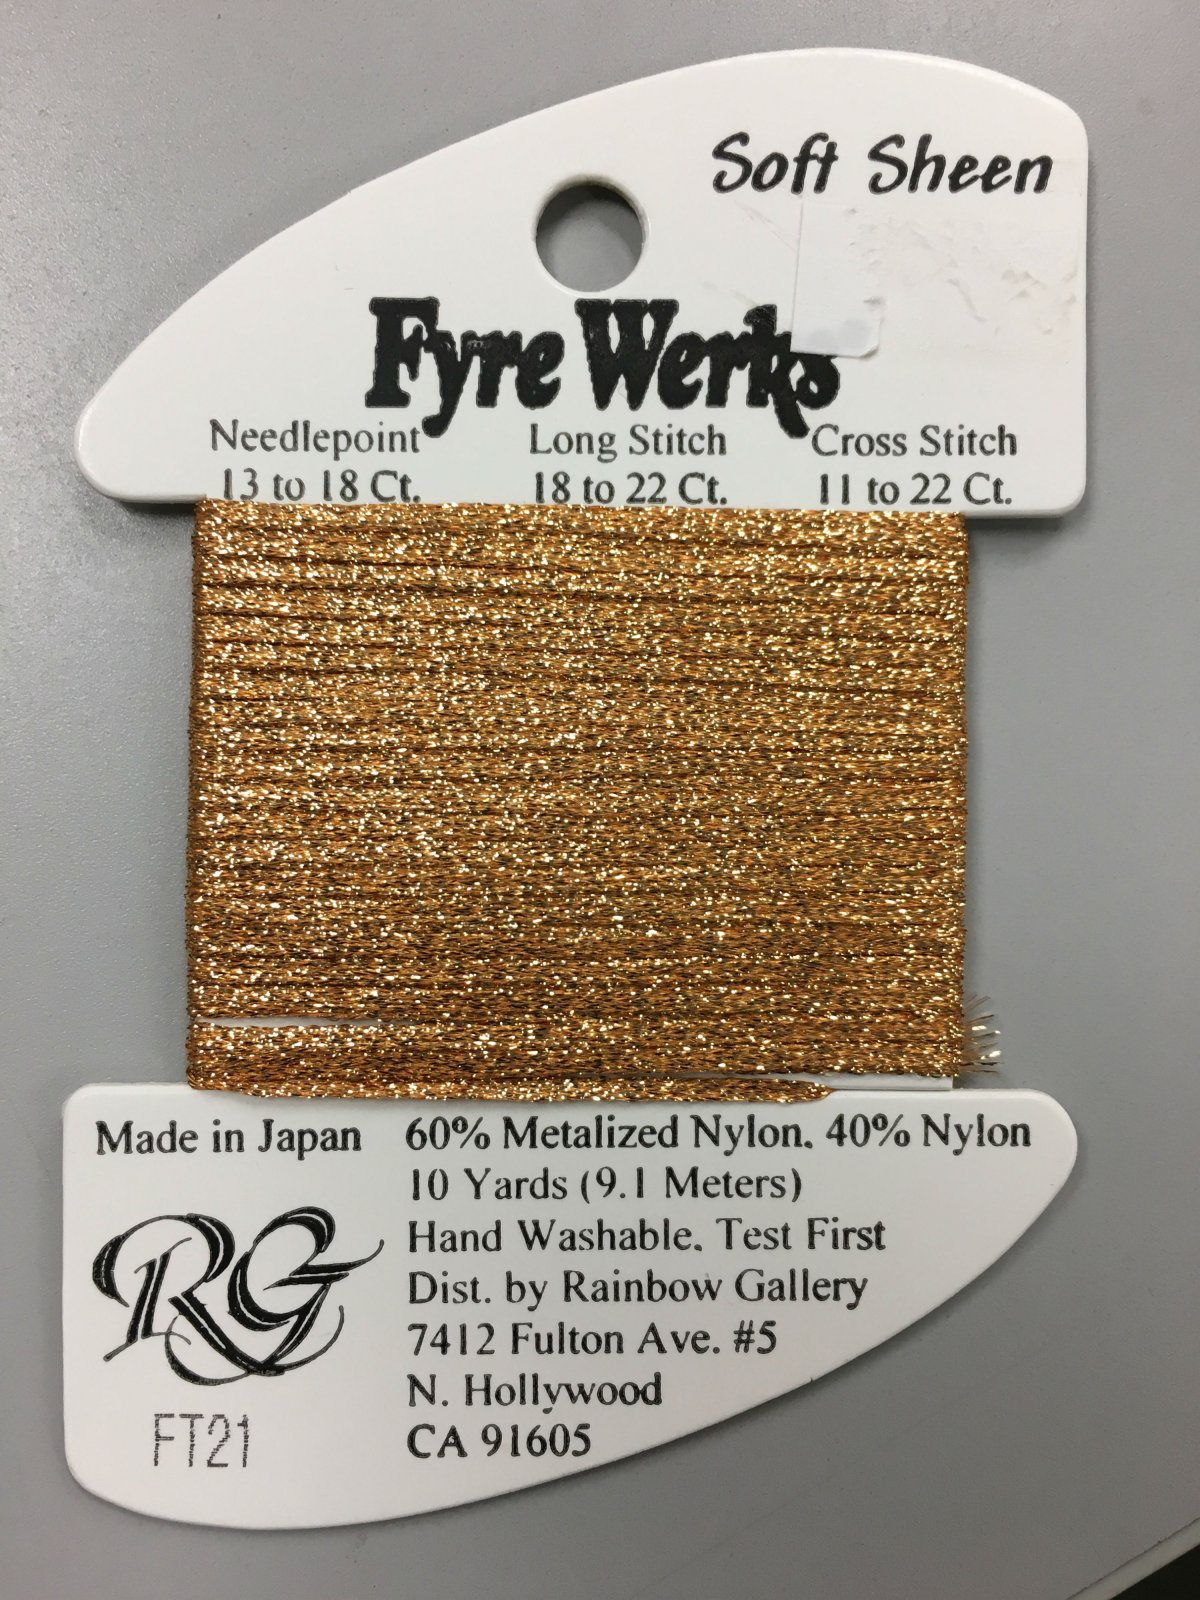 Fyre Werks Soft Sheen FT21